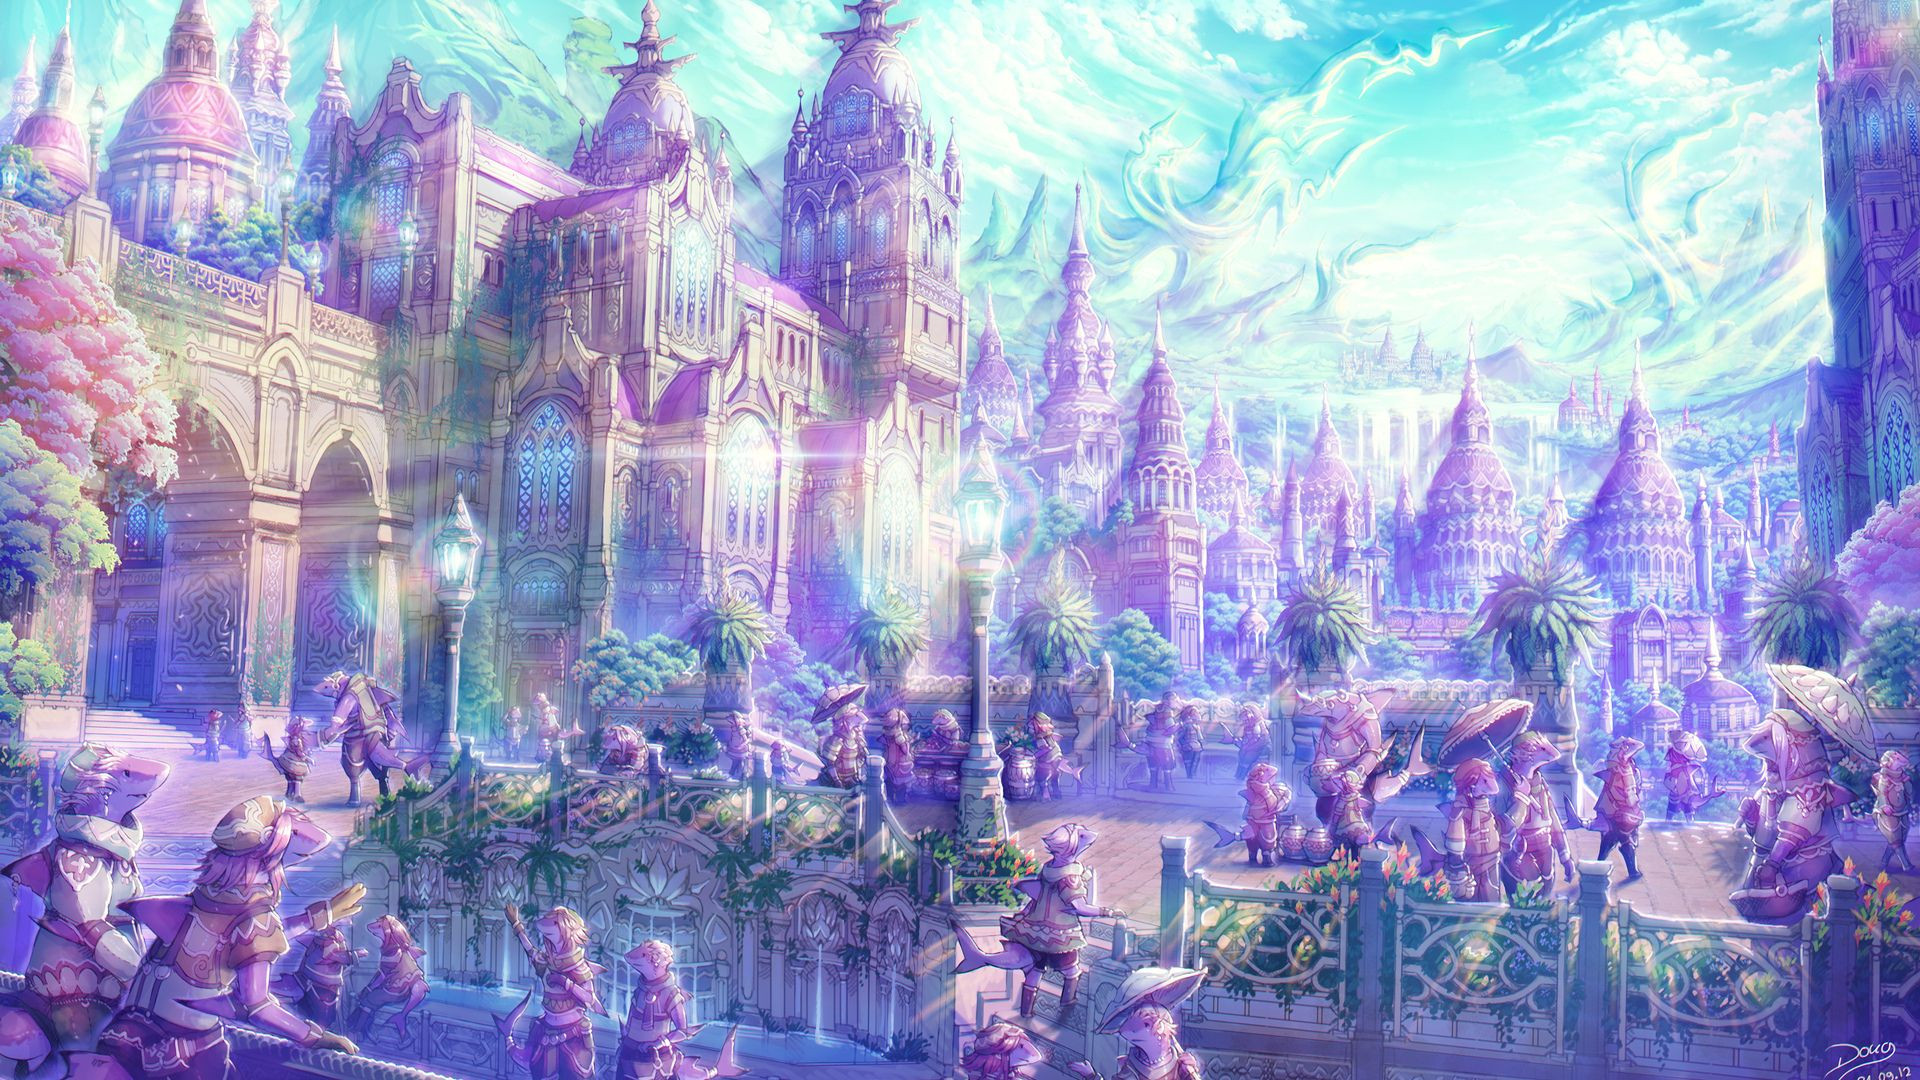 Anime Artistic Cities Fantasy Soft Castles Landscapes Places Magical Wallpaper 1920x1080 23877 Wallpa Landscape Wallpaper Fantasy Landscape Anime Scenery